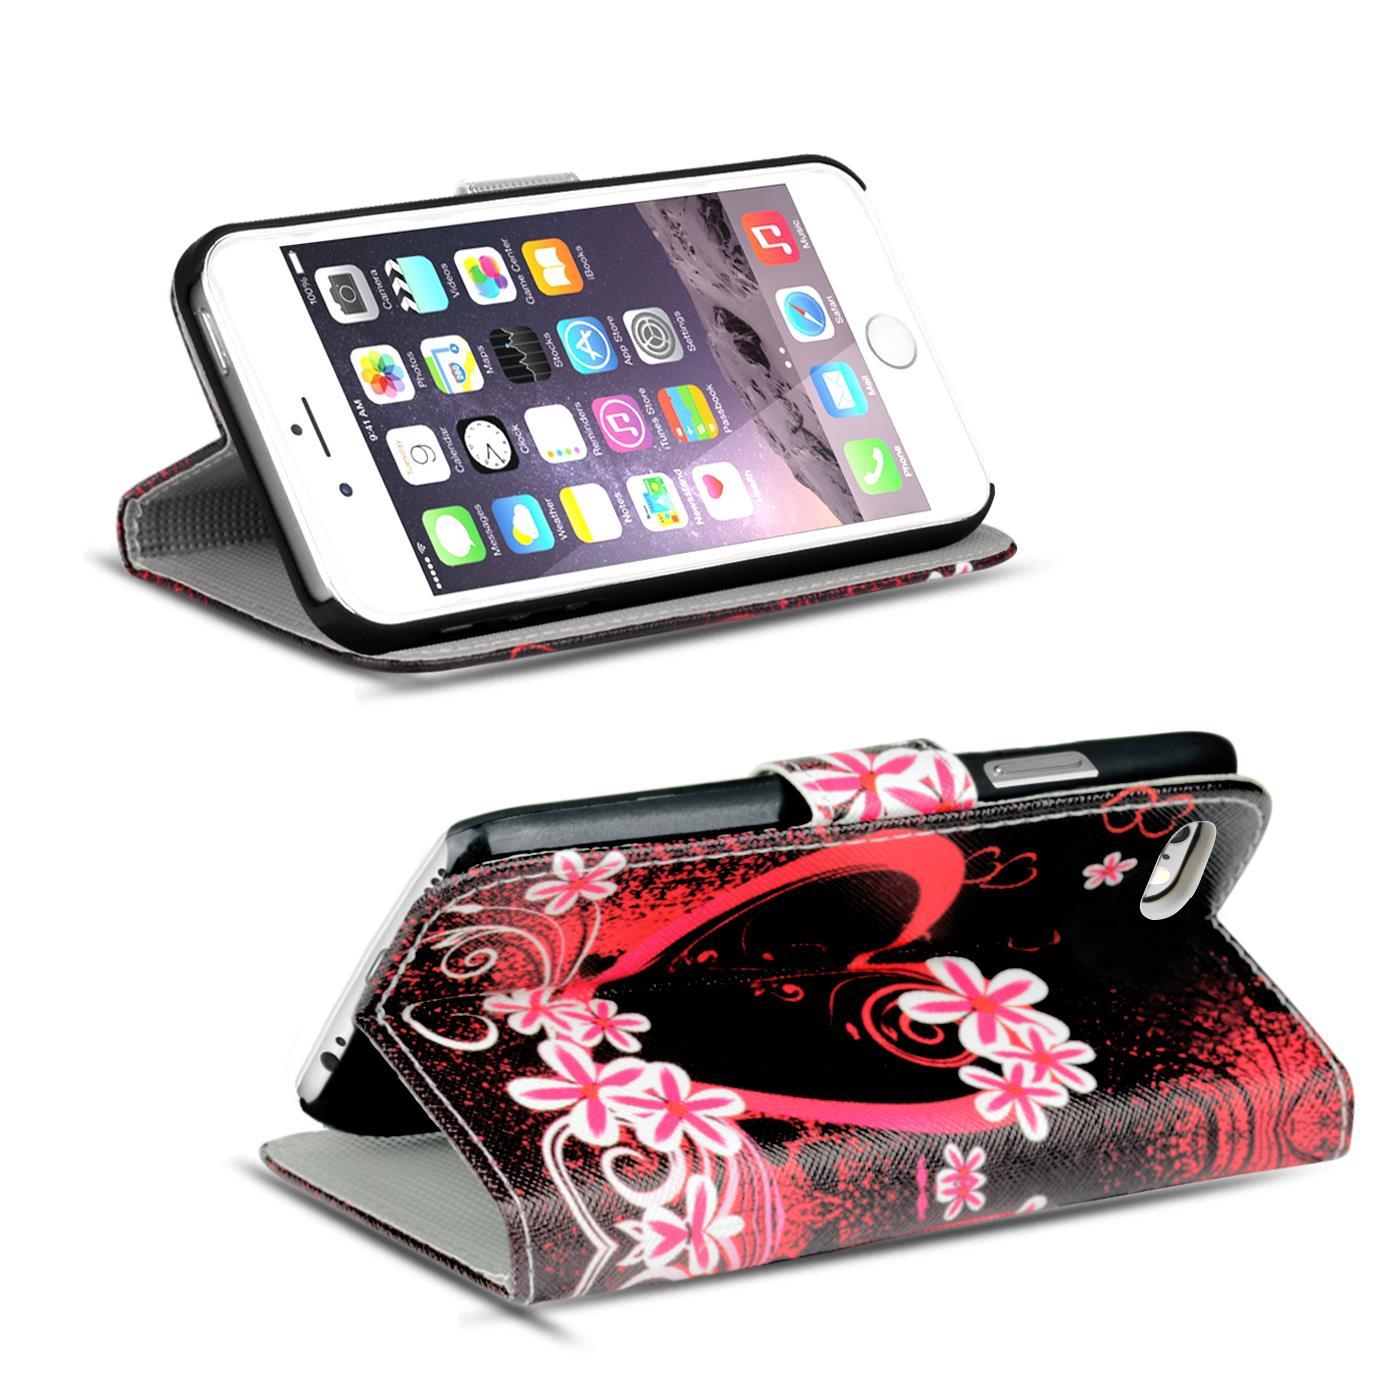 handy tasche f r apple iphone 6 6s plus h lle pu leder motiv schutzh lle case ebay. Black Bedroom Furniture Sets. Home Design Ideas